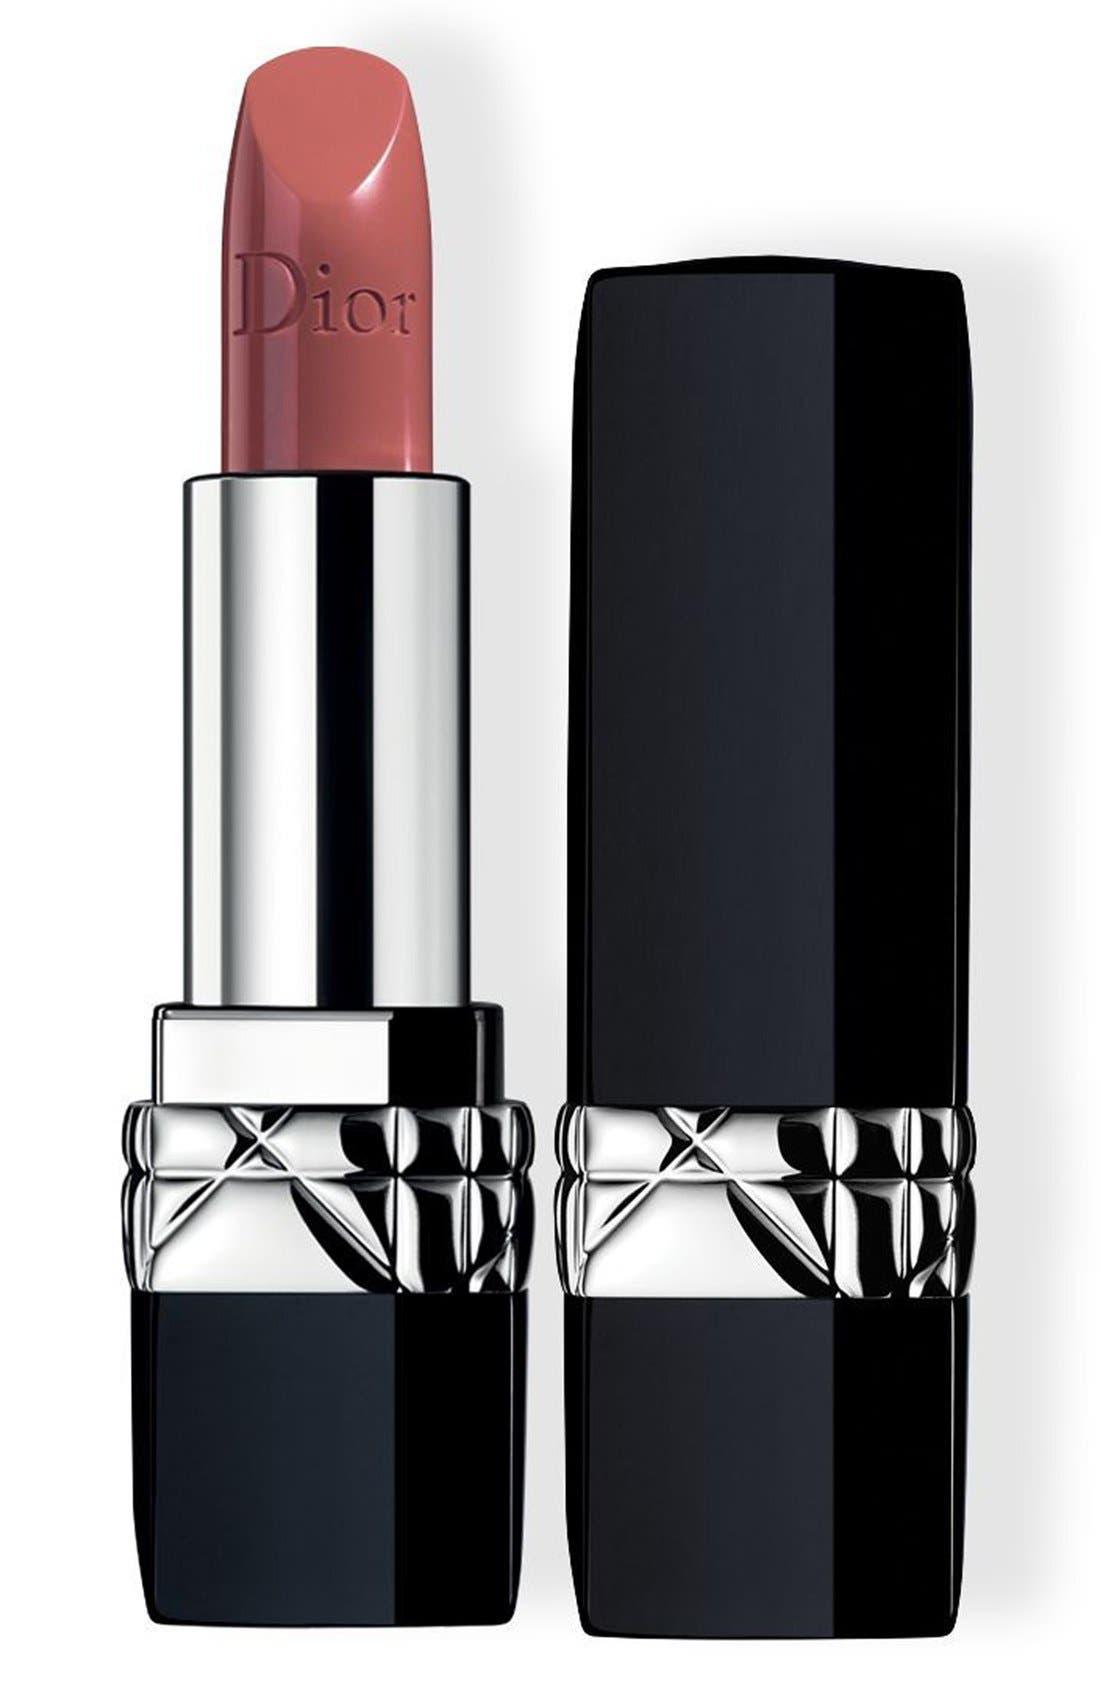 Dior Couture Color Rouge Dior Lipstick - 414 Saint Germain